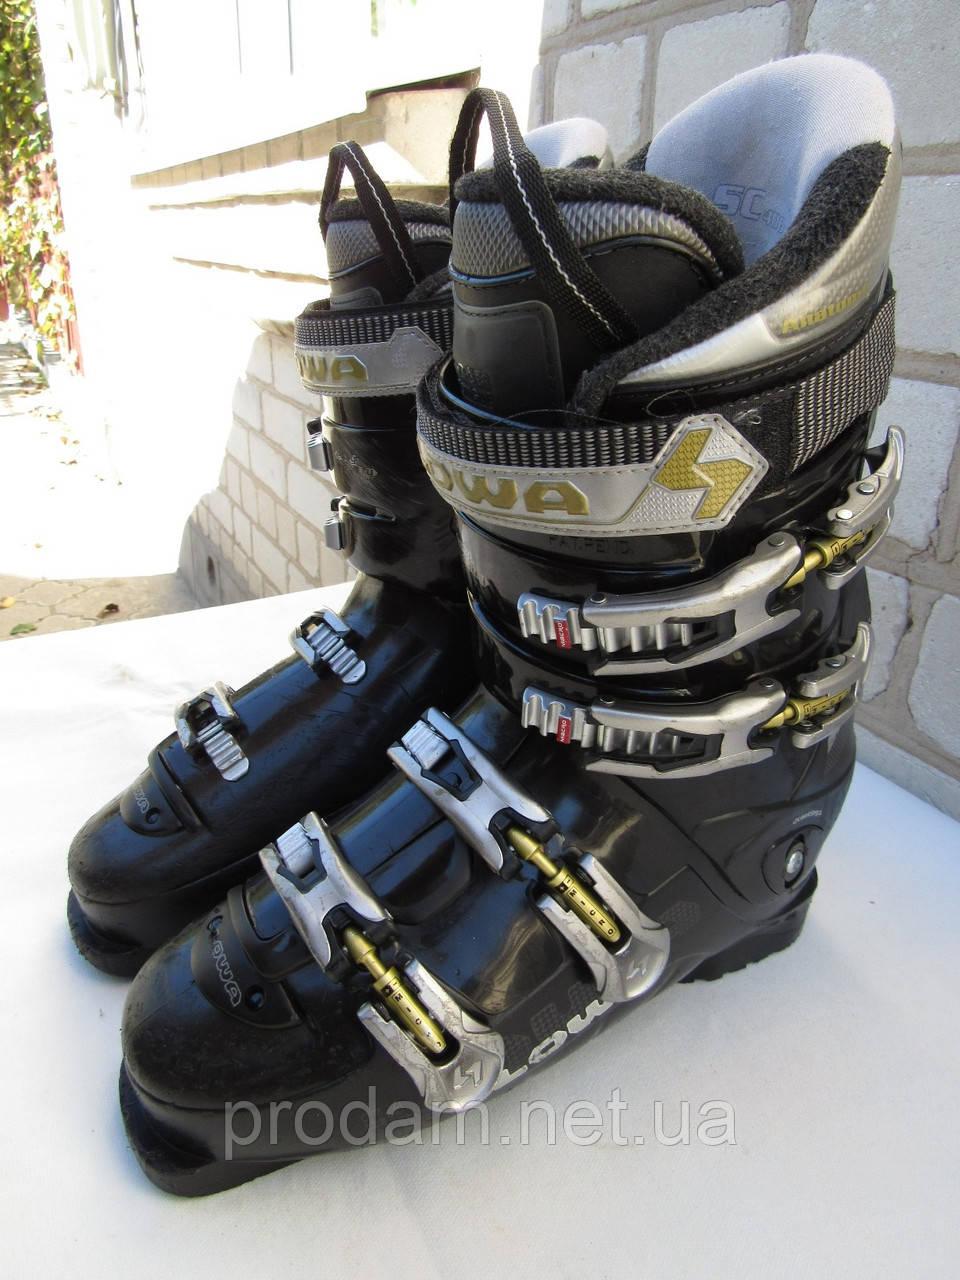 Лыжные ботинки  Salomon  розмір 28 см